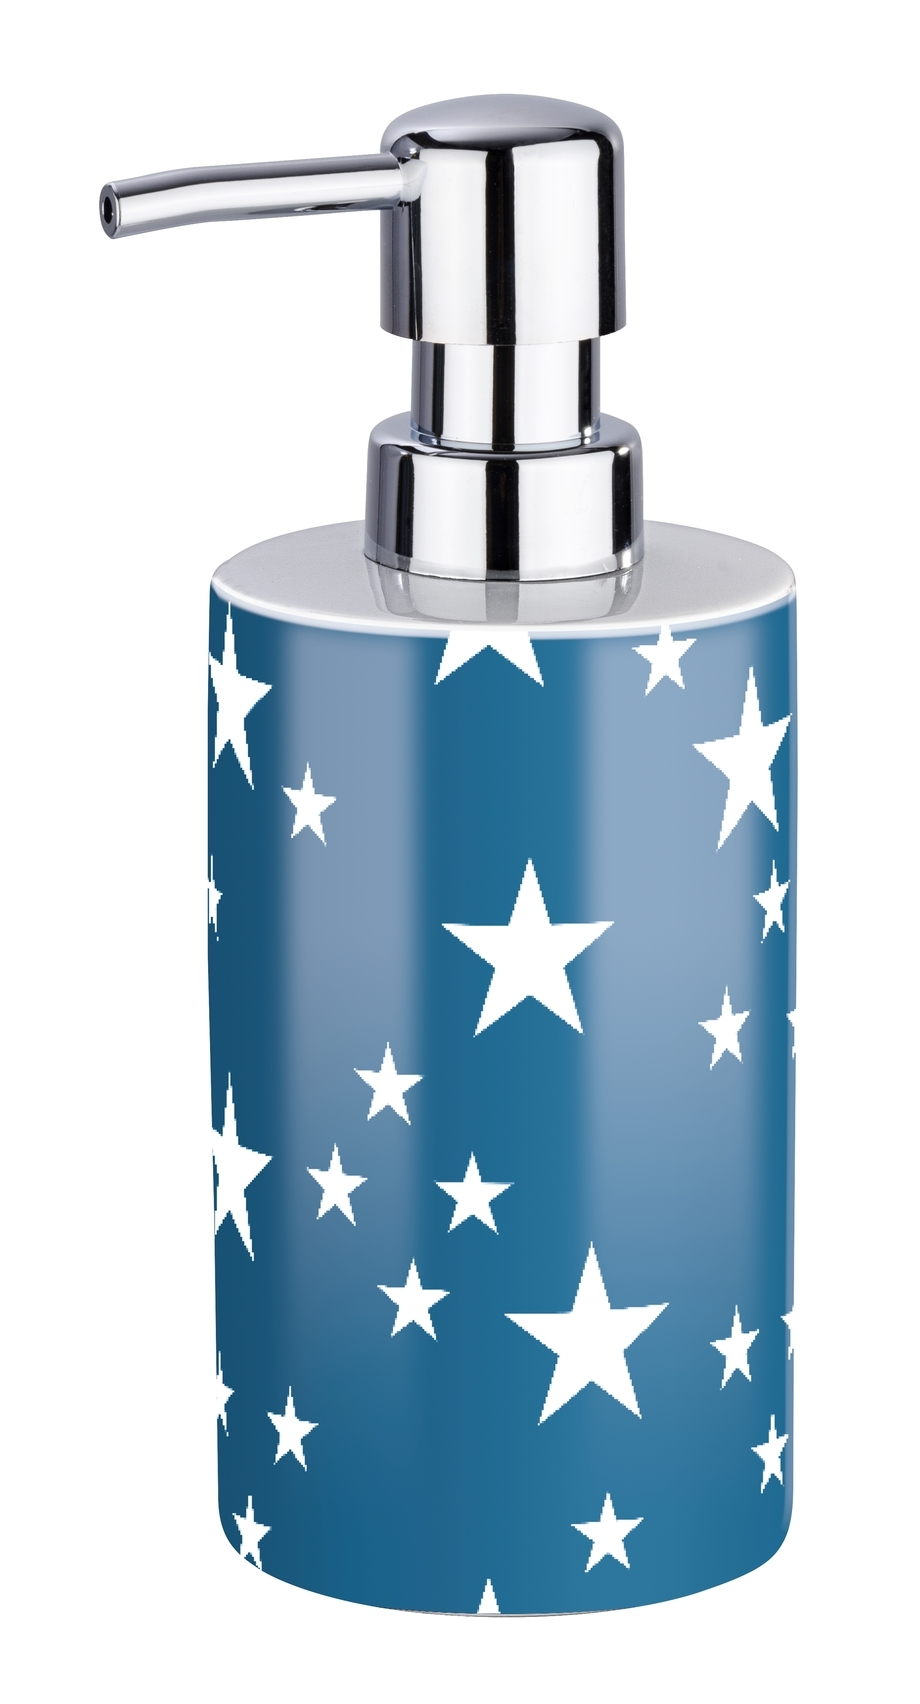 Dozator pentru sapun, din ceramica, Stella Albastru, Ø9xH18 cm imagine